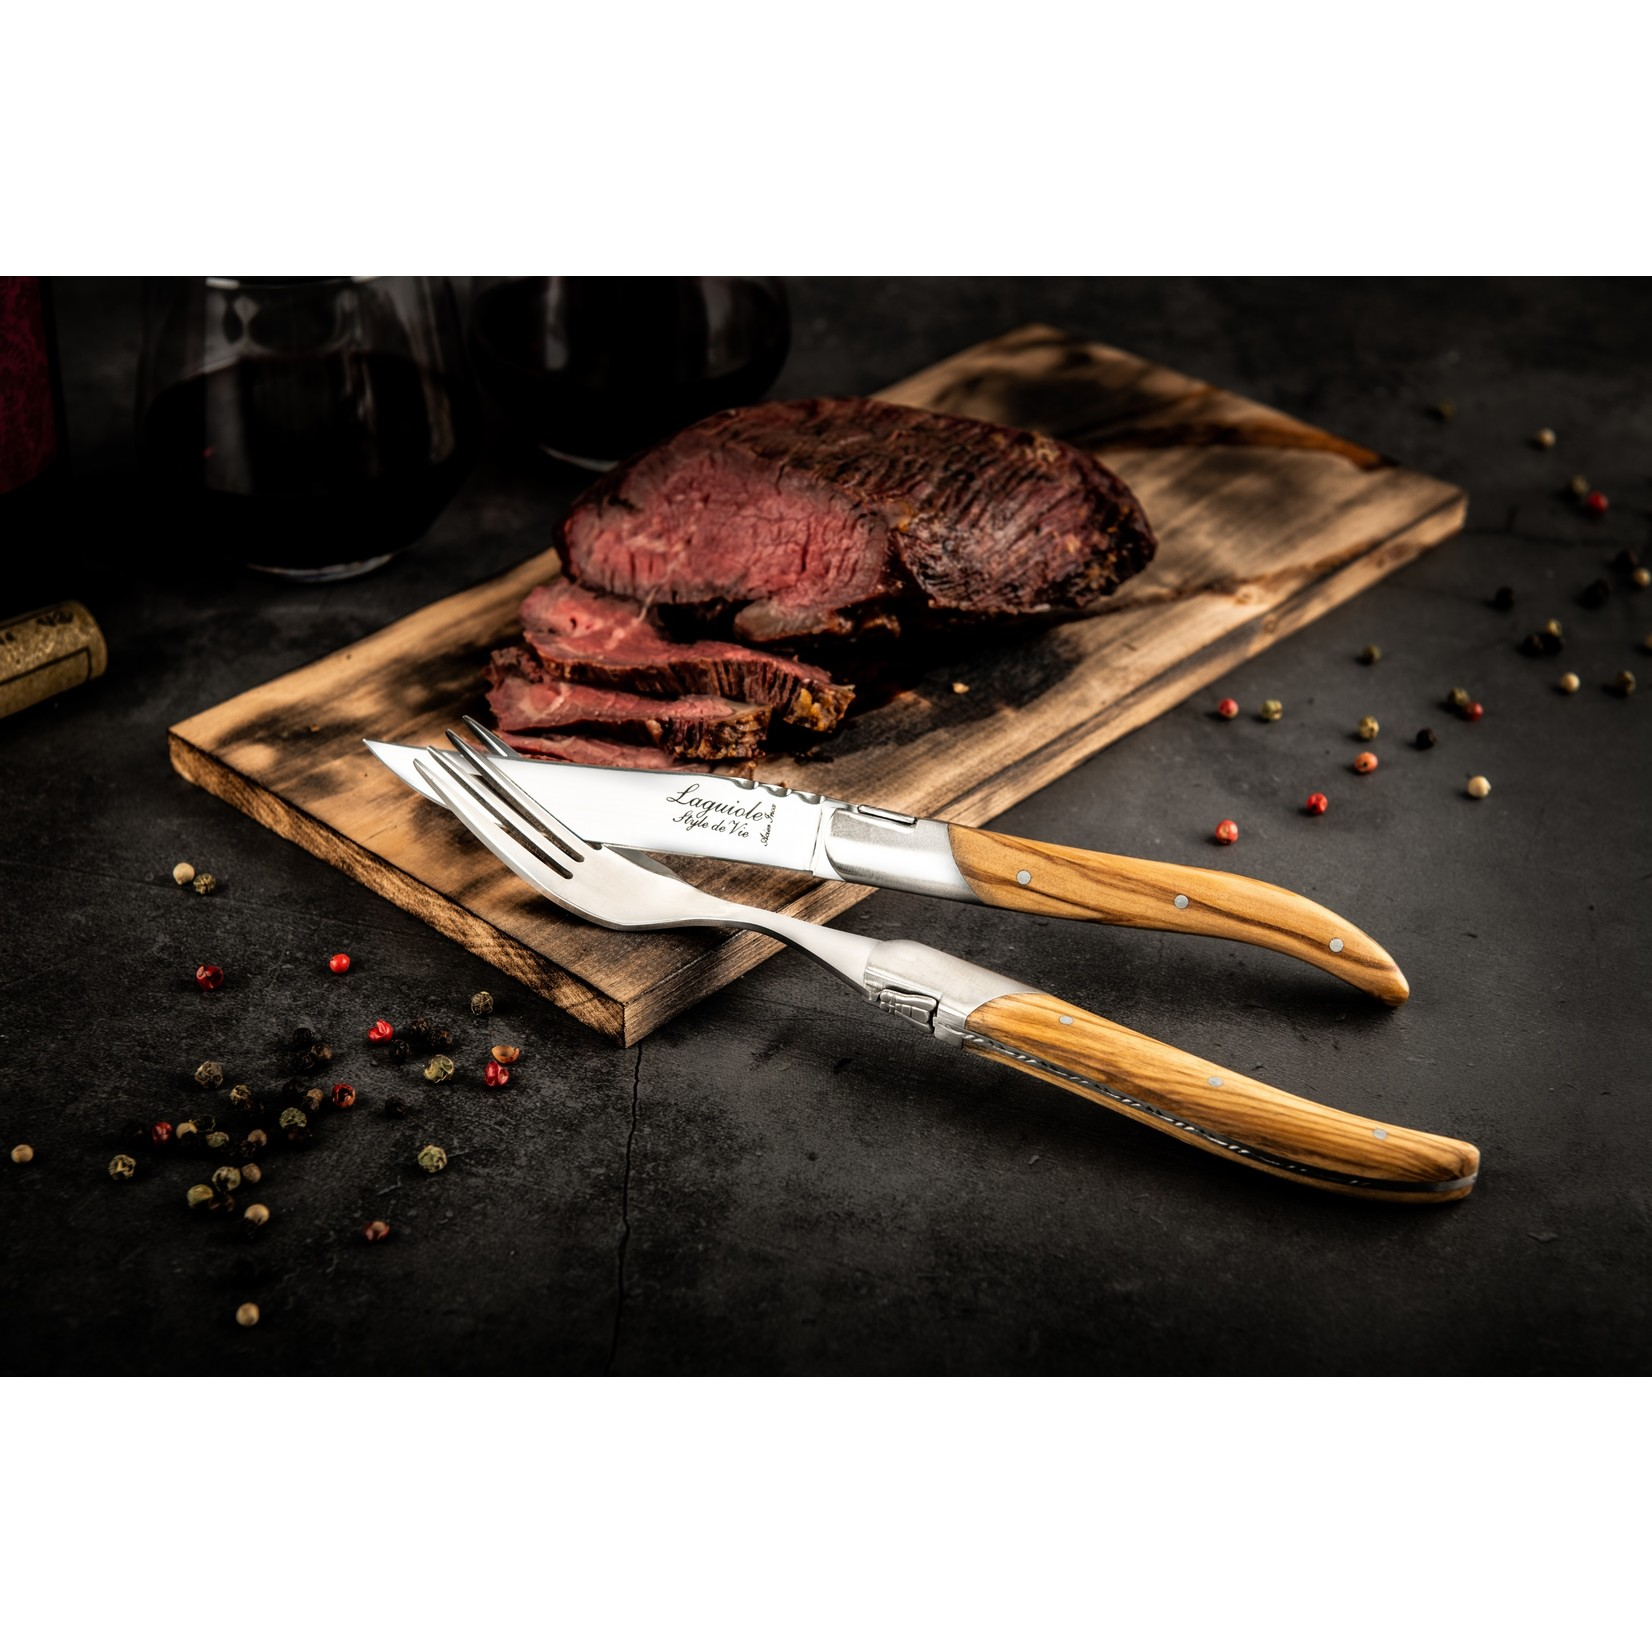 Laguiole Style de Vie Laguiole Style de Vie Luxury Line Steakmessenset 6-delig olijfhout